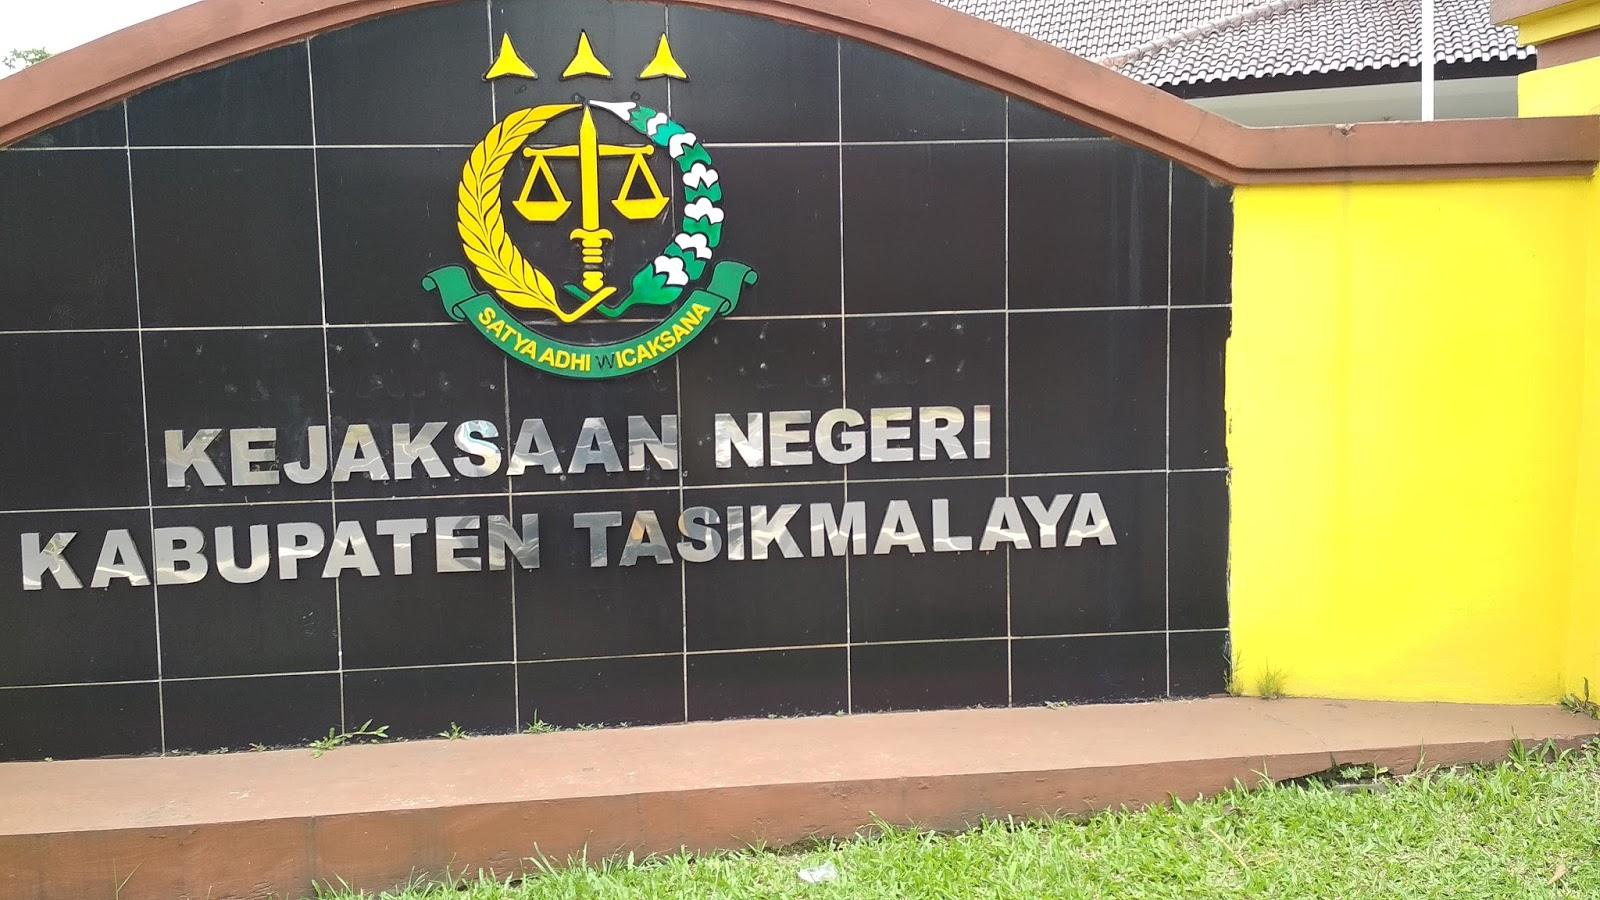 kantor kejaksan negeri singaparna kabupaten tasikmalaya